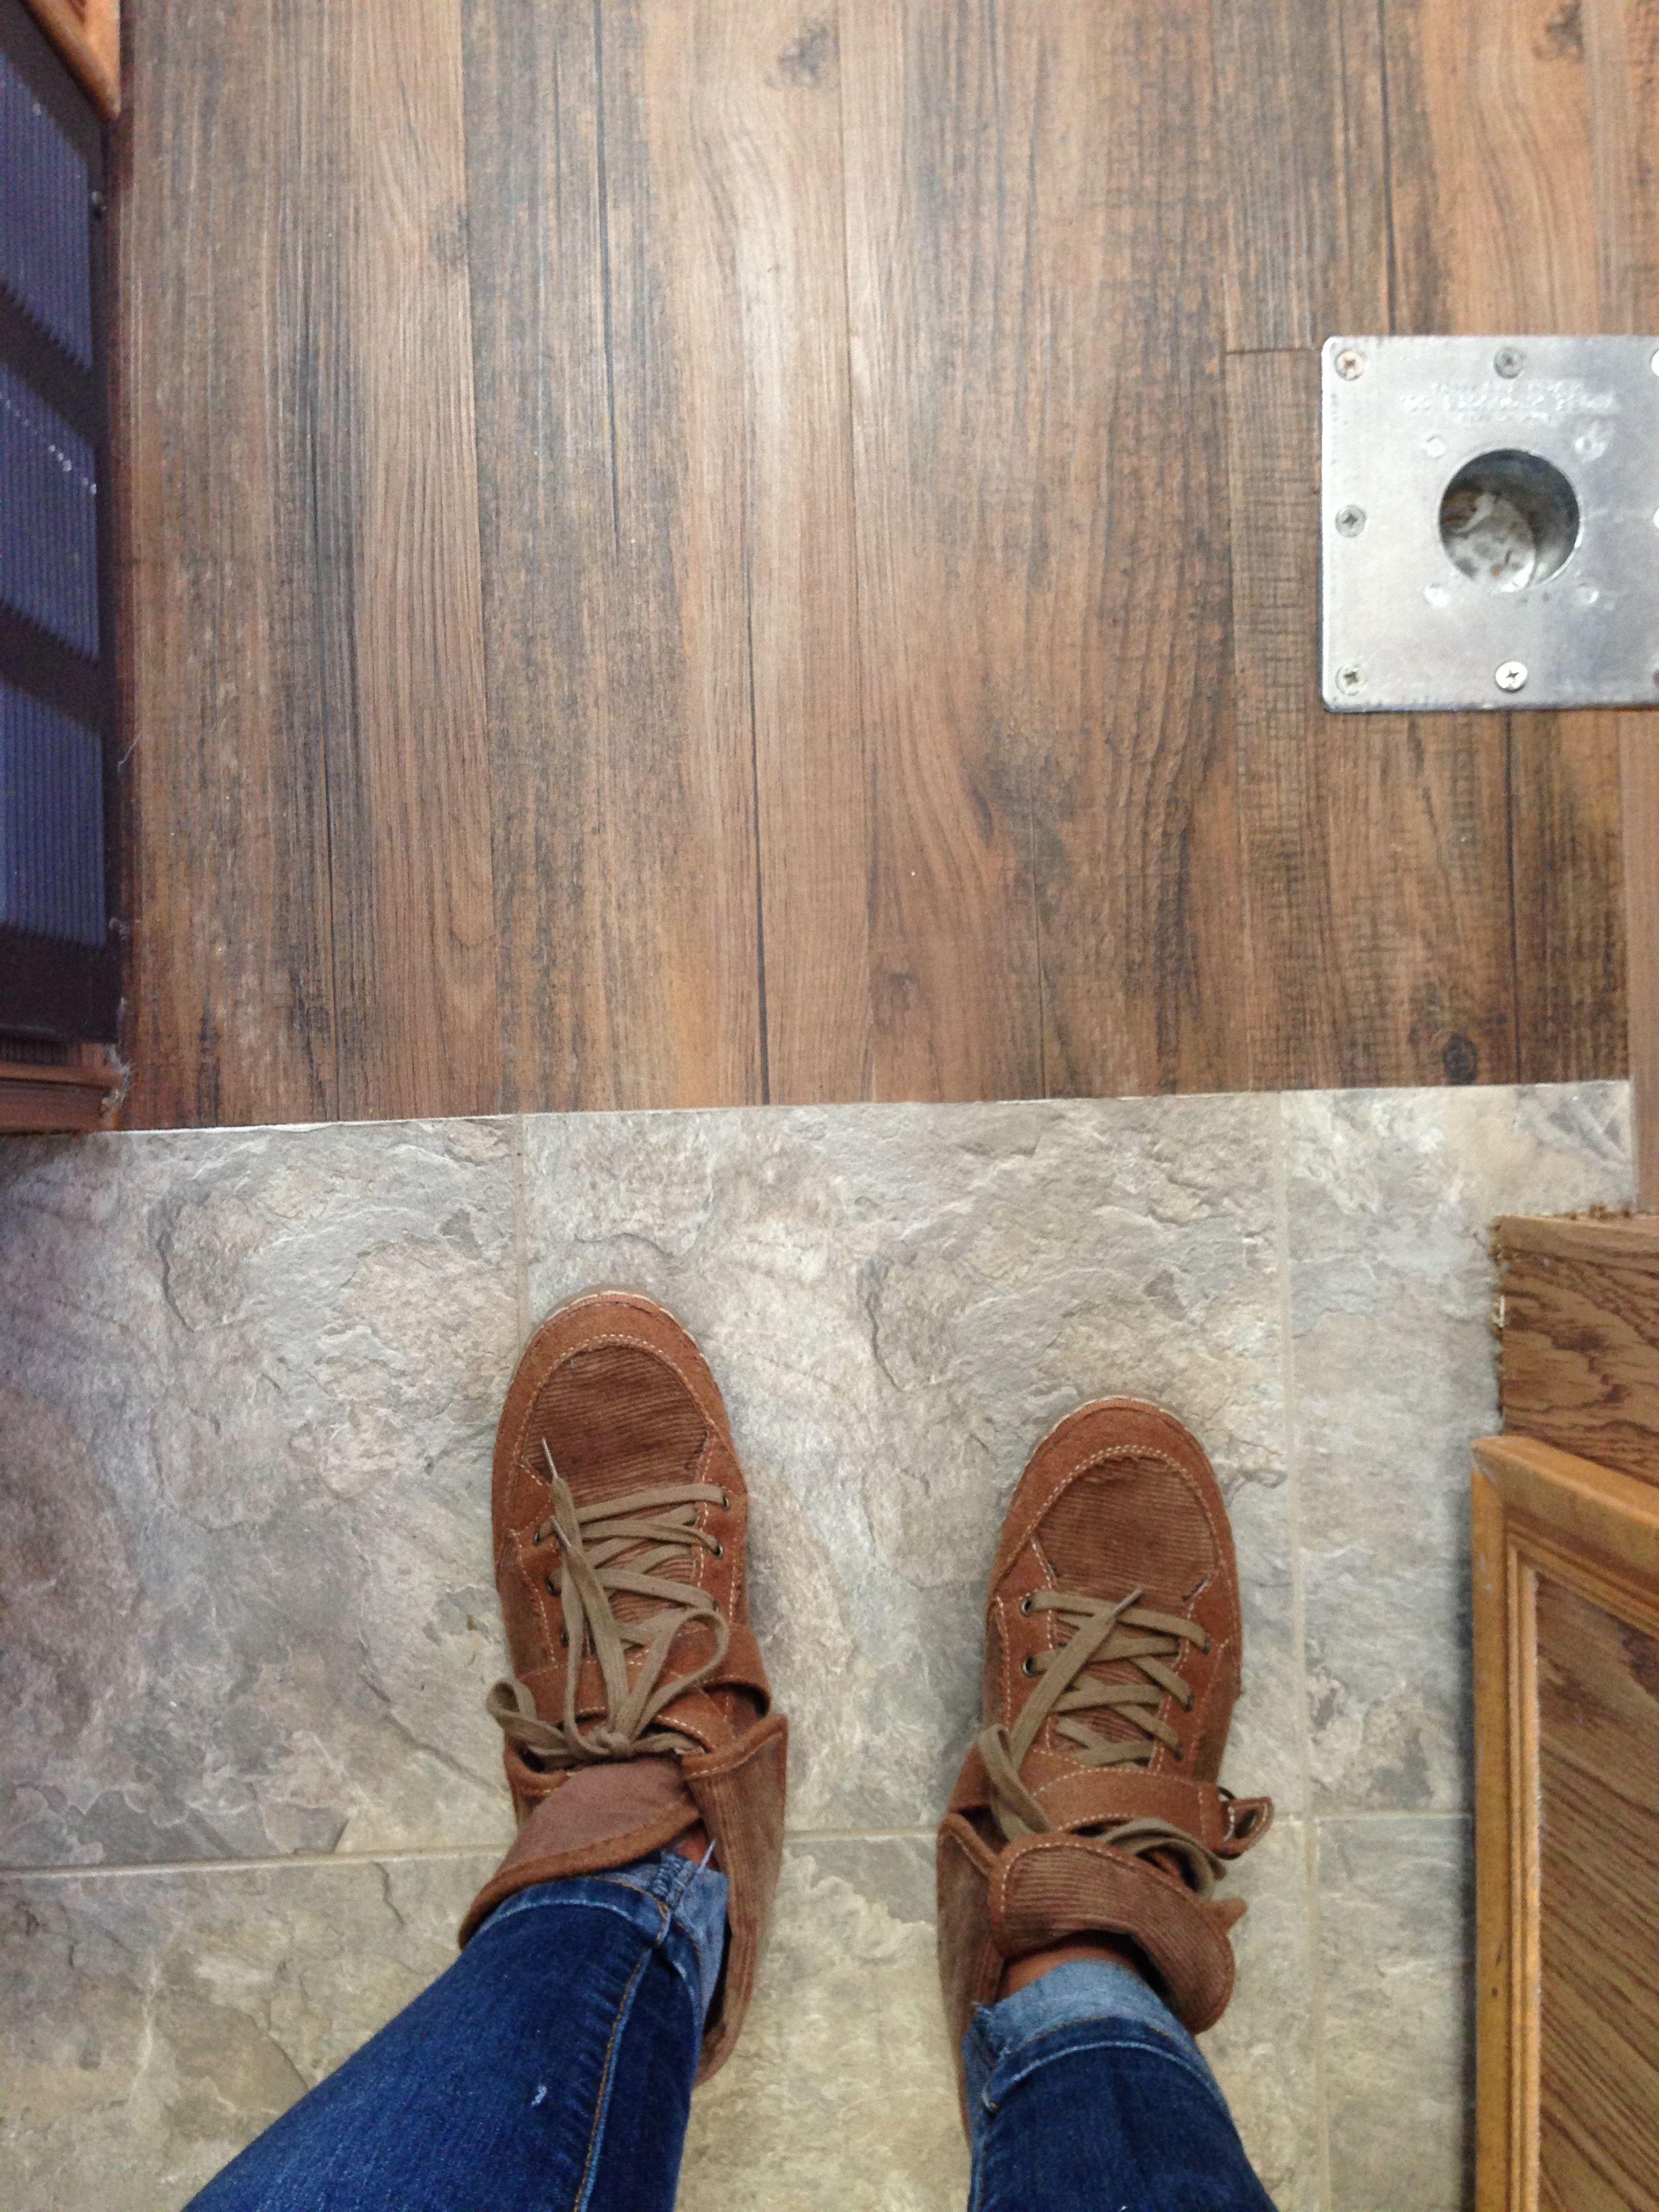 Rv Remodel 4 Floors Beige Carpet Rv Remodel Where To Buy Carpet